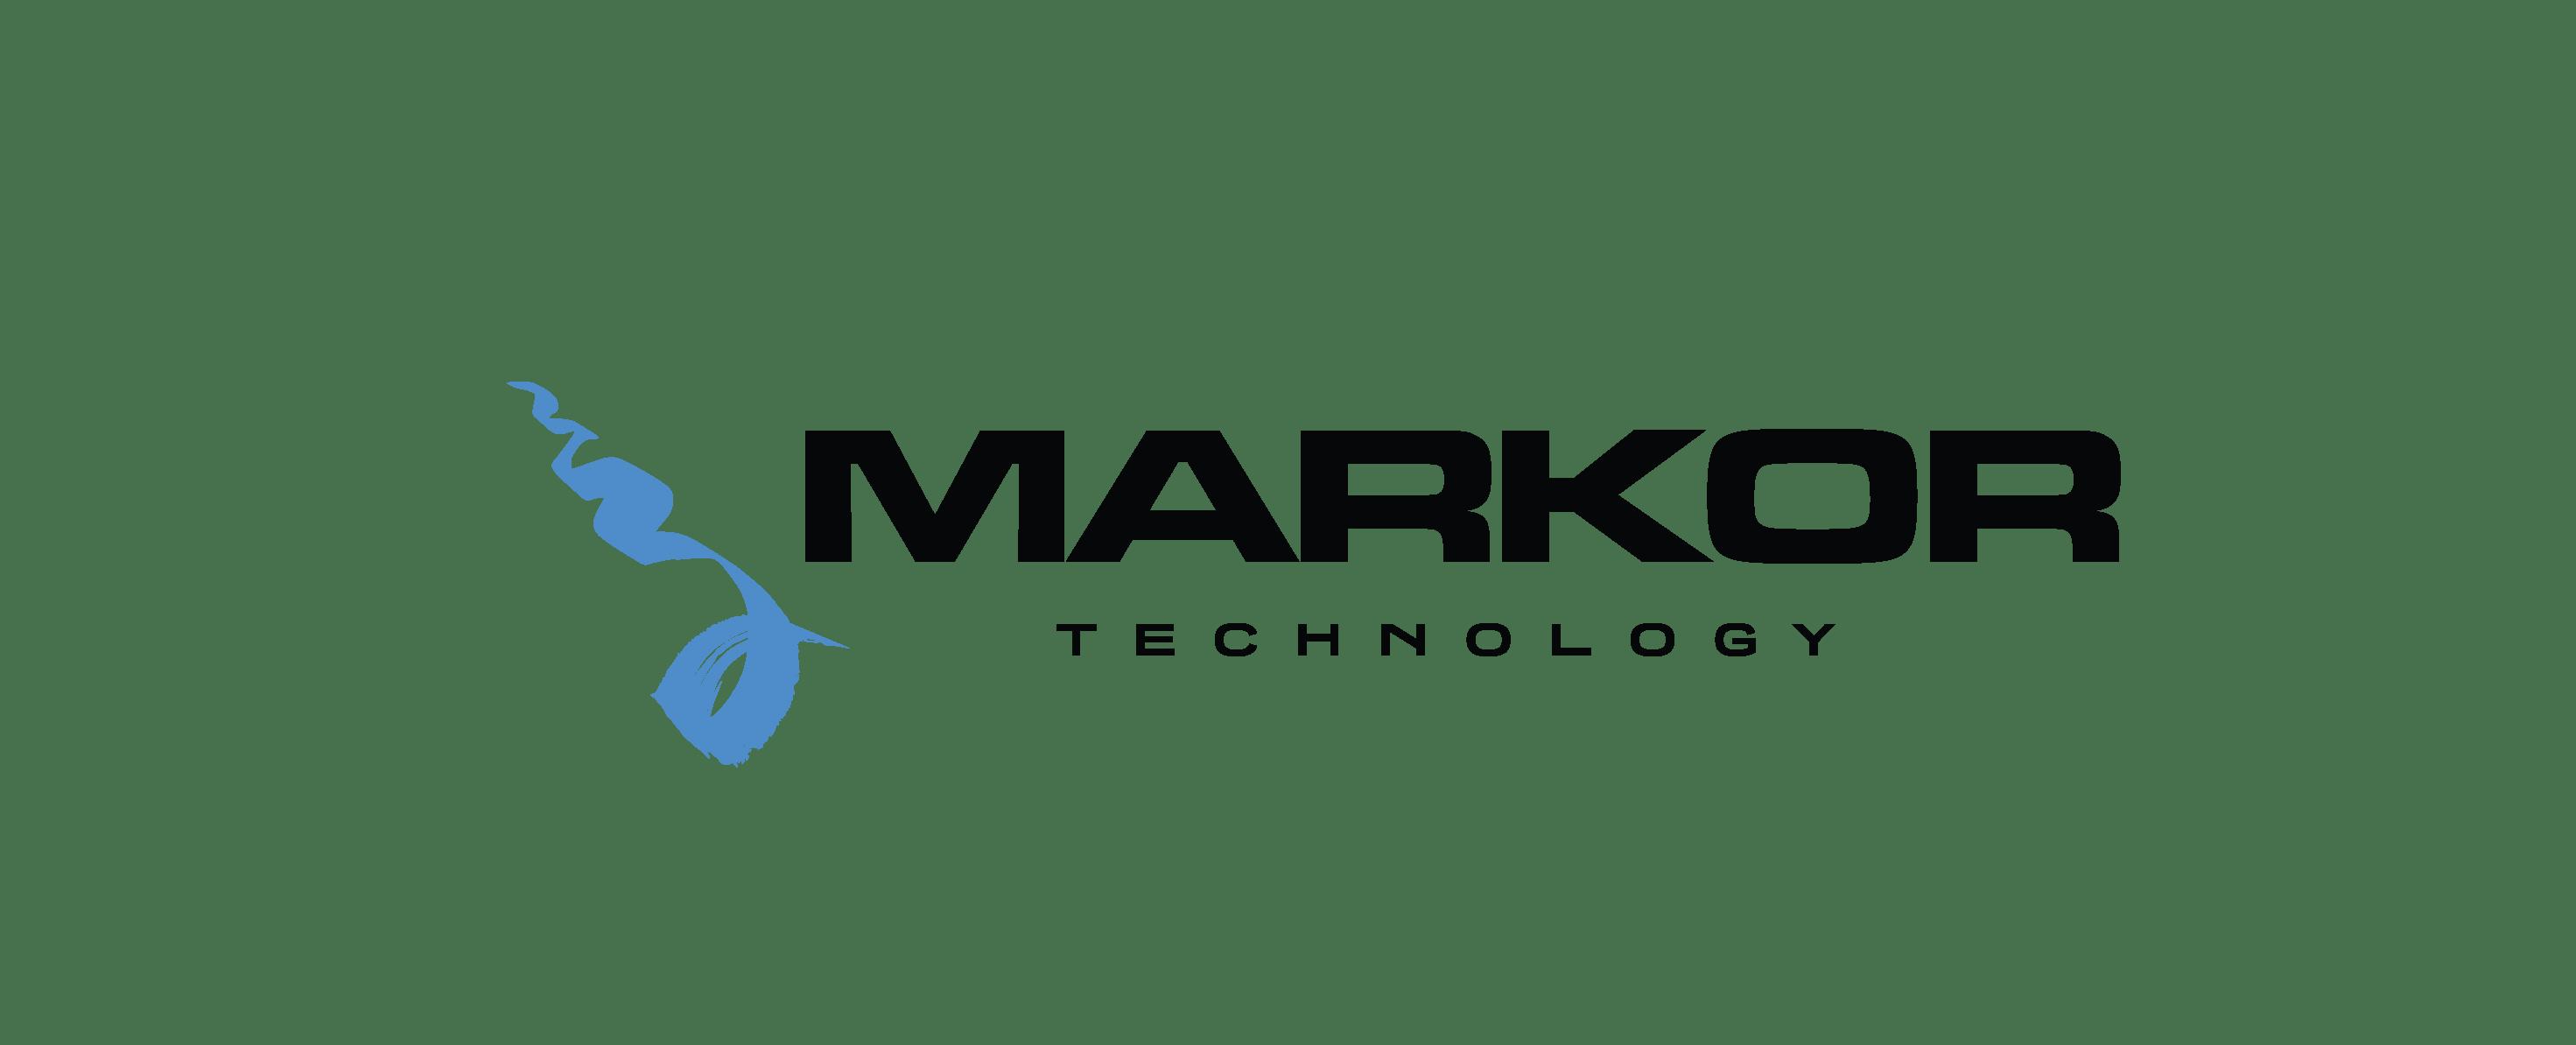 Markor Technology games